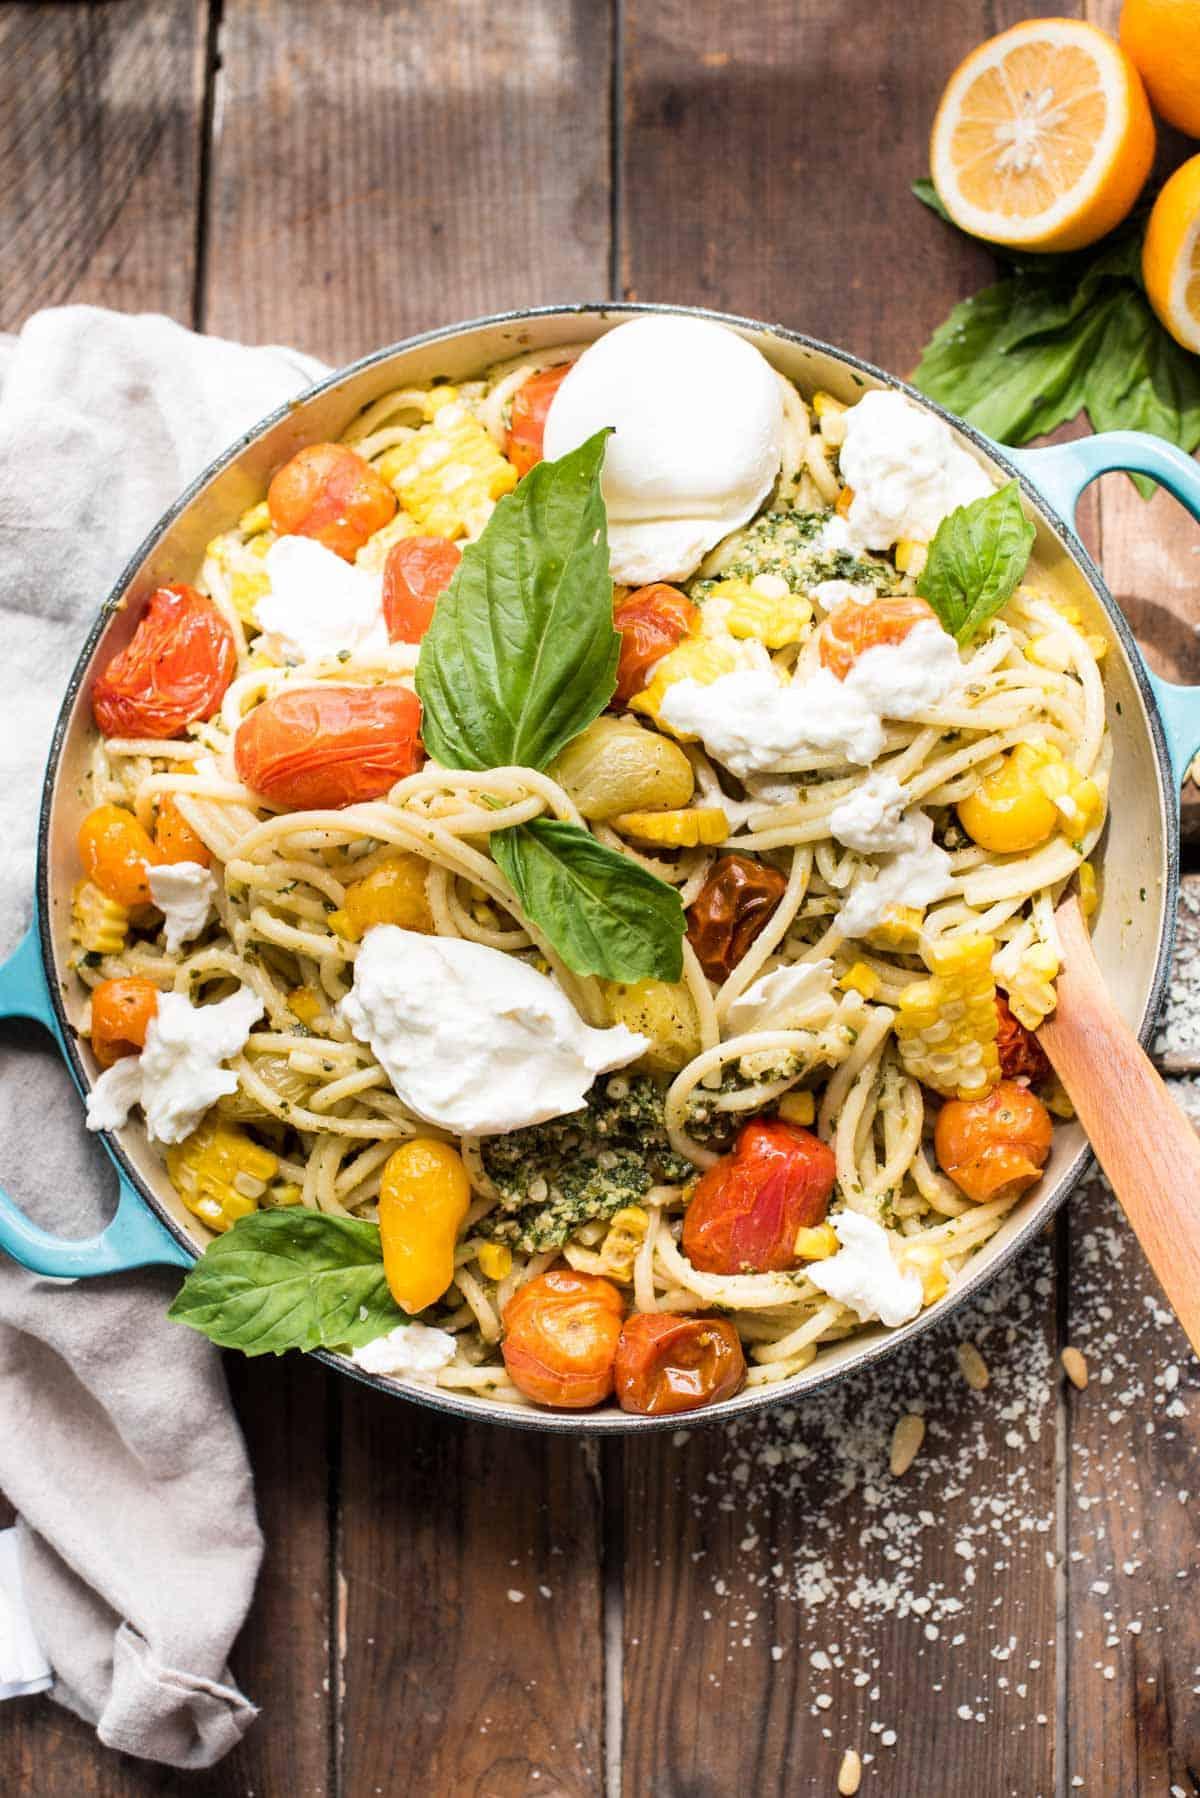 Veggie Pesto Pasta with tomatoes, corn, and burrata